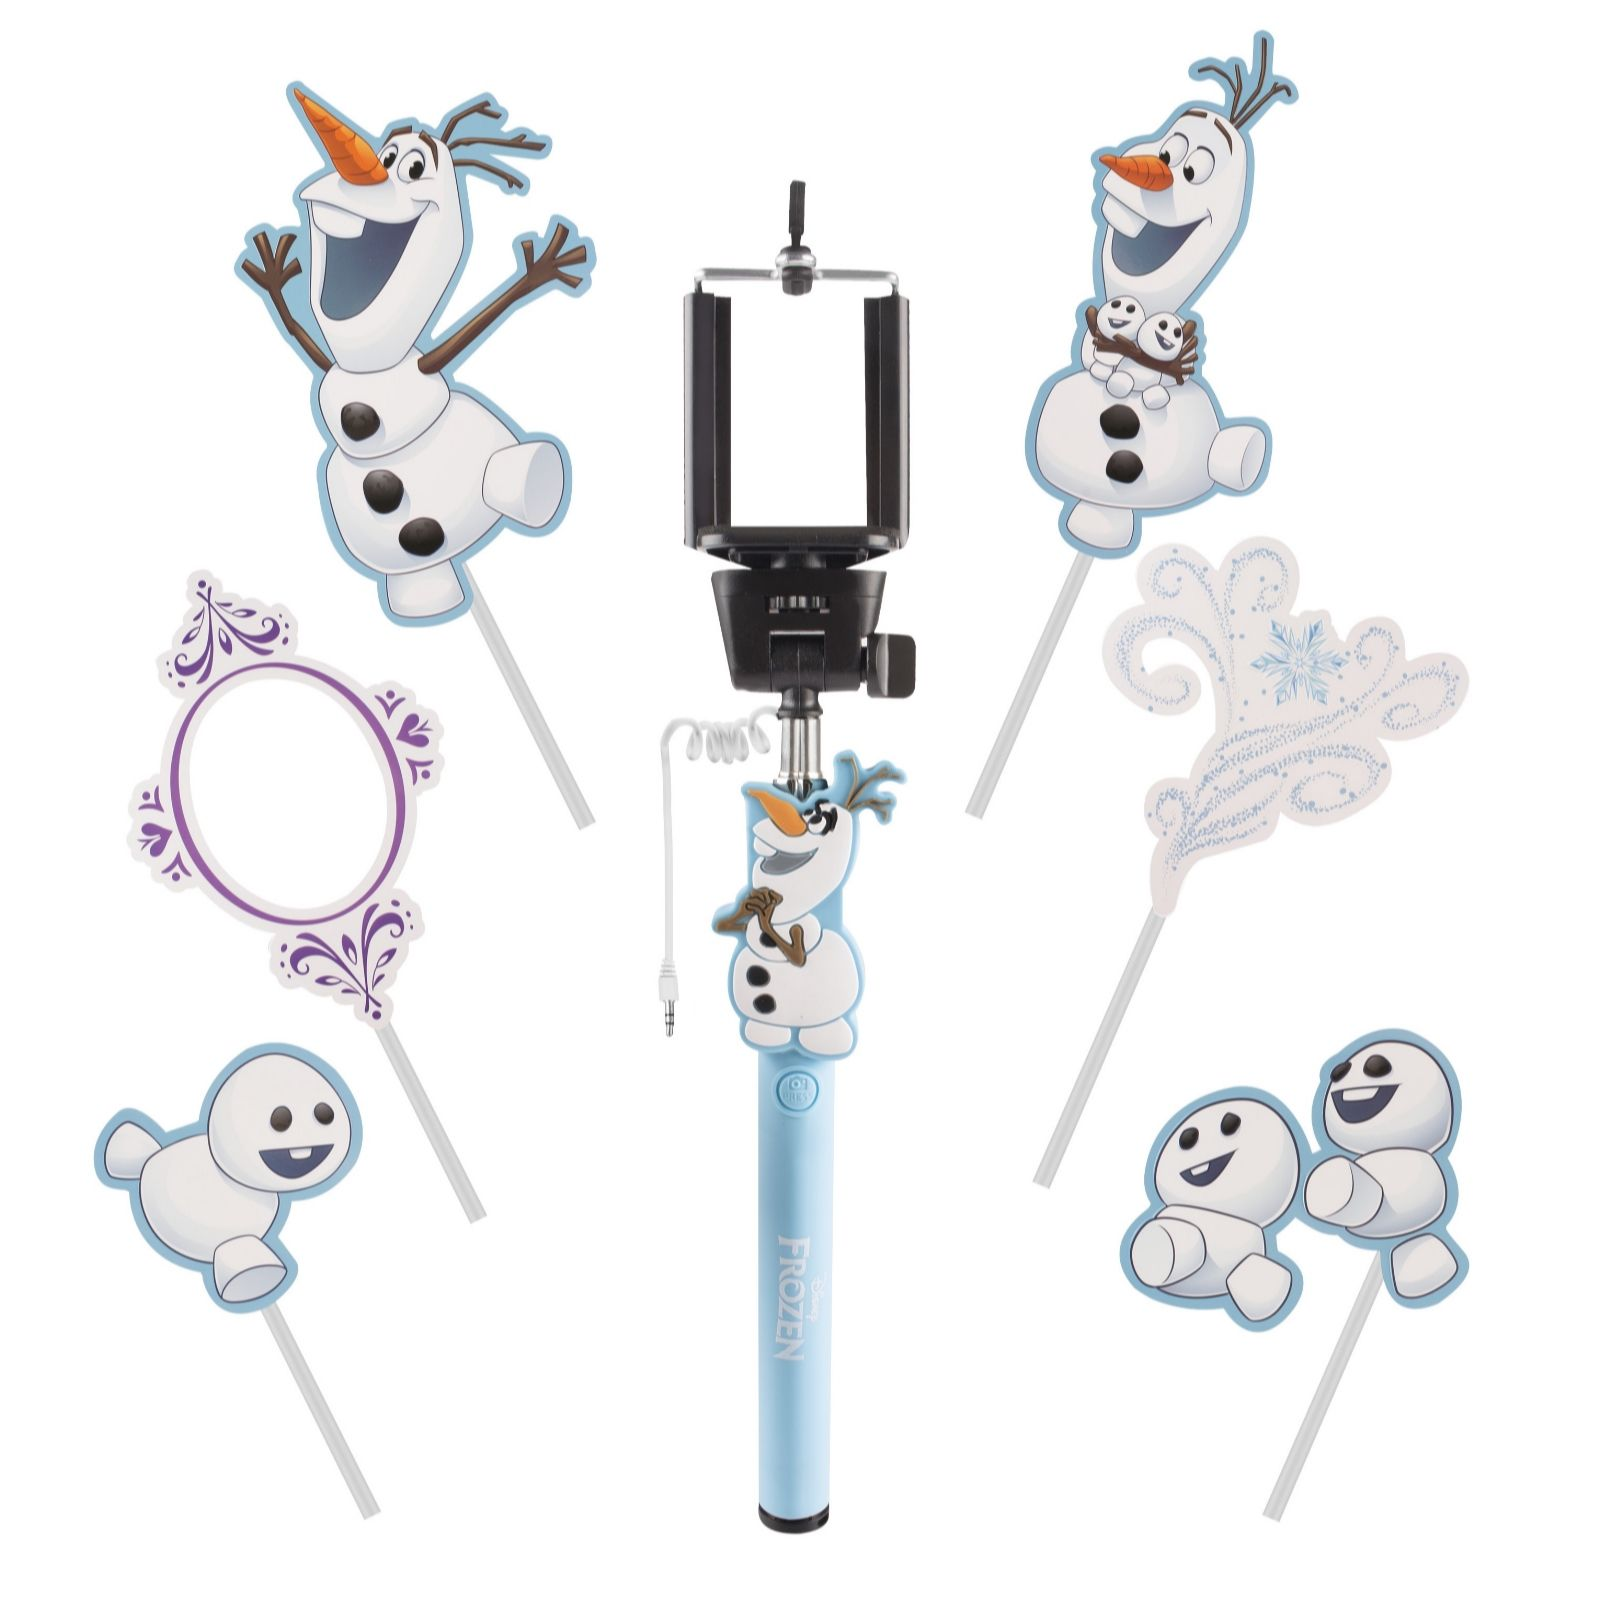 Disney Frozen Childrens Selfie Kit with Props - QVC UK